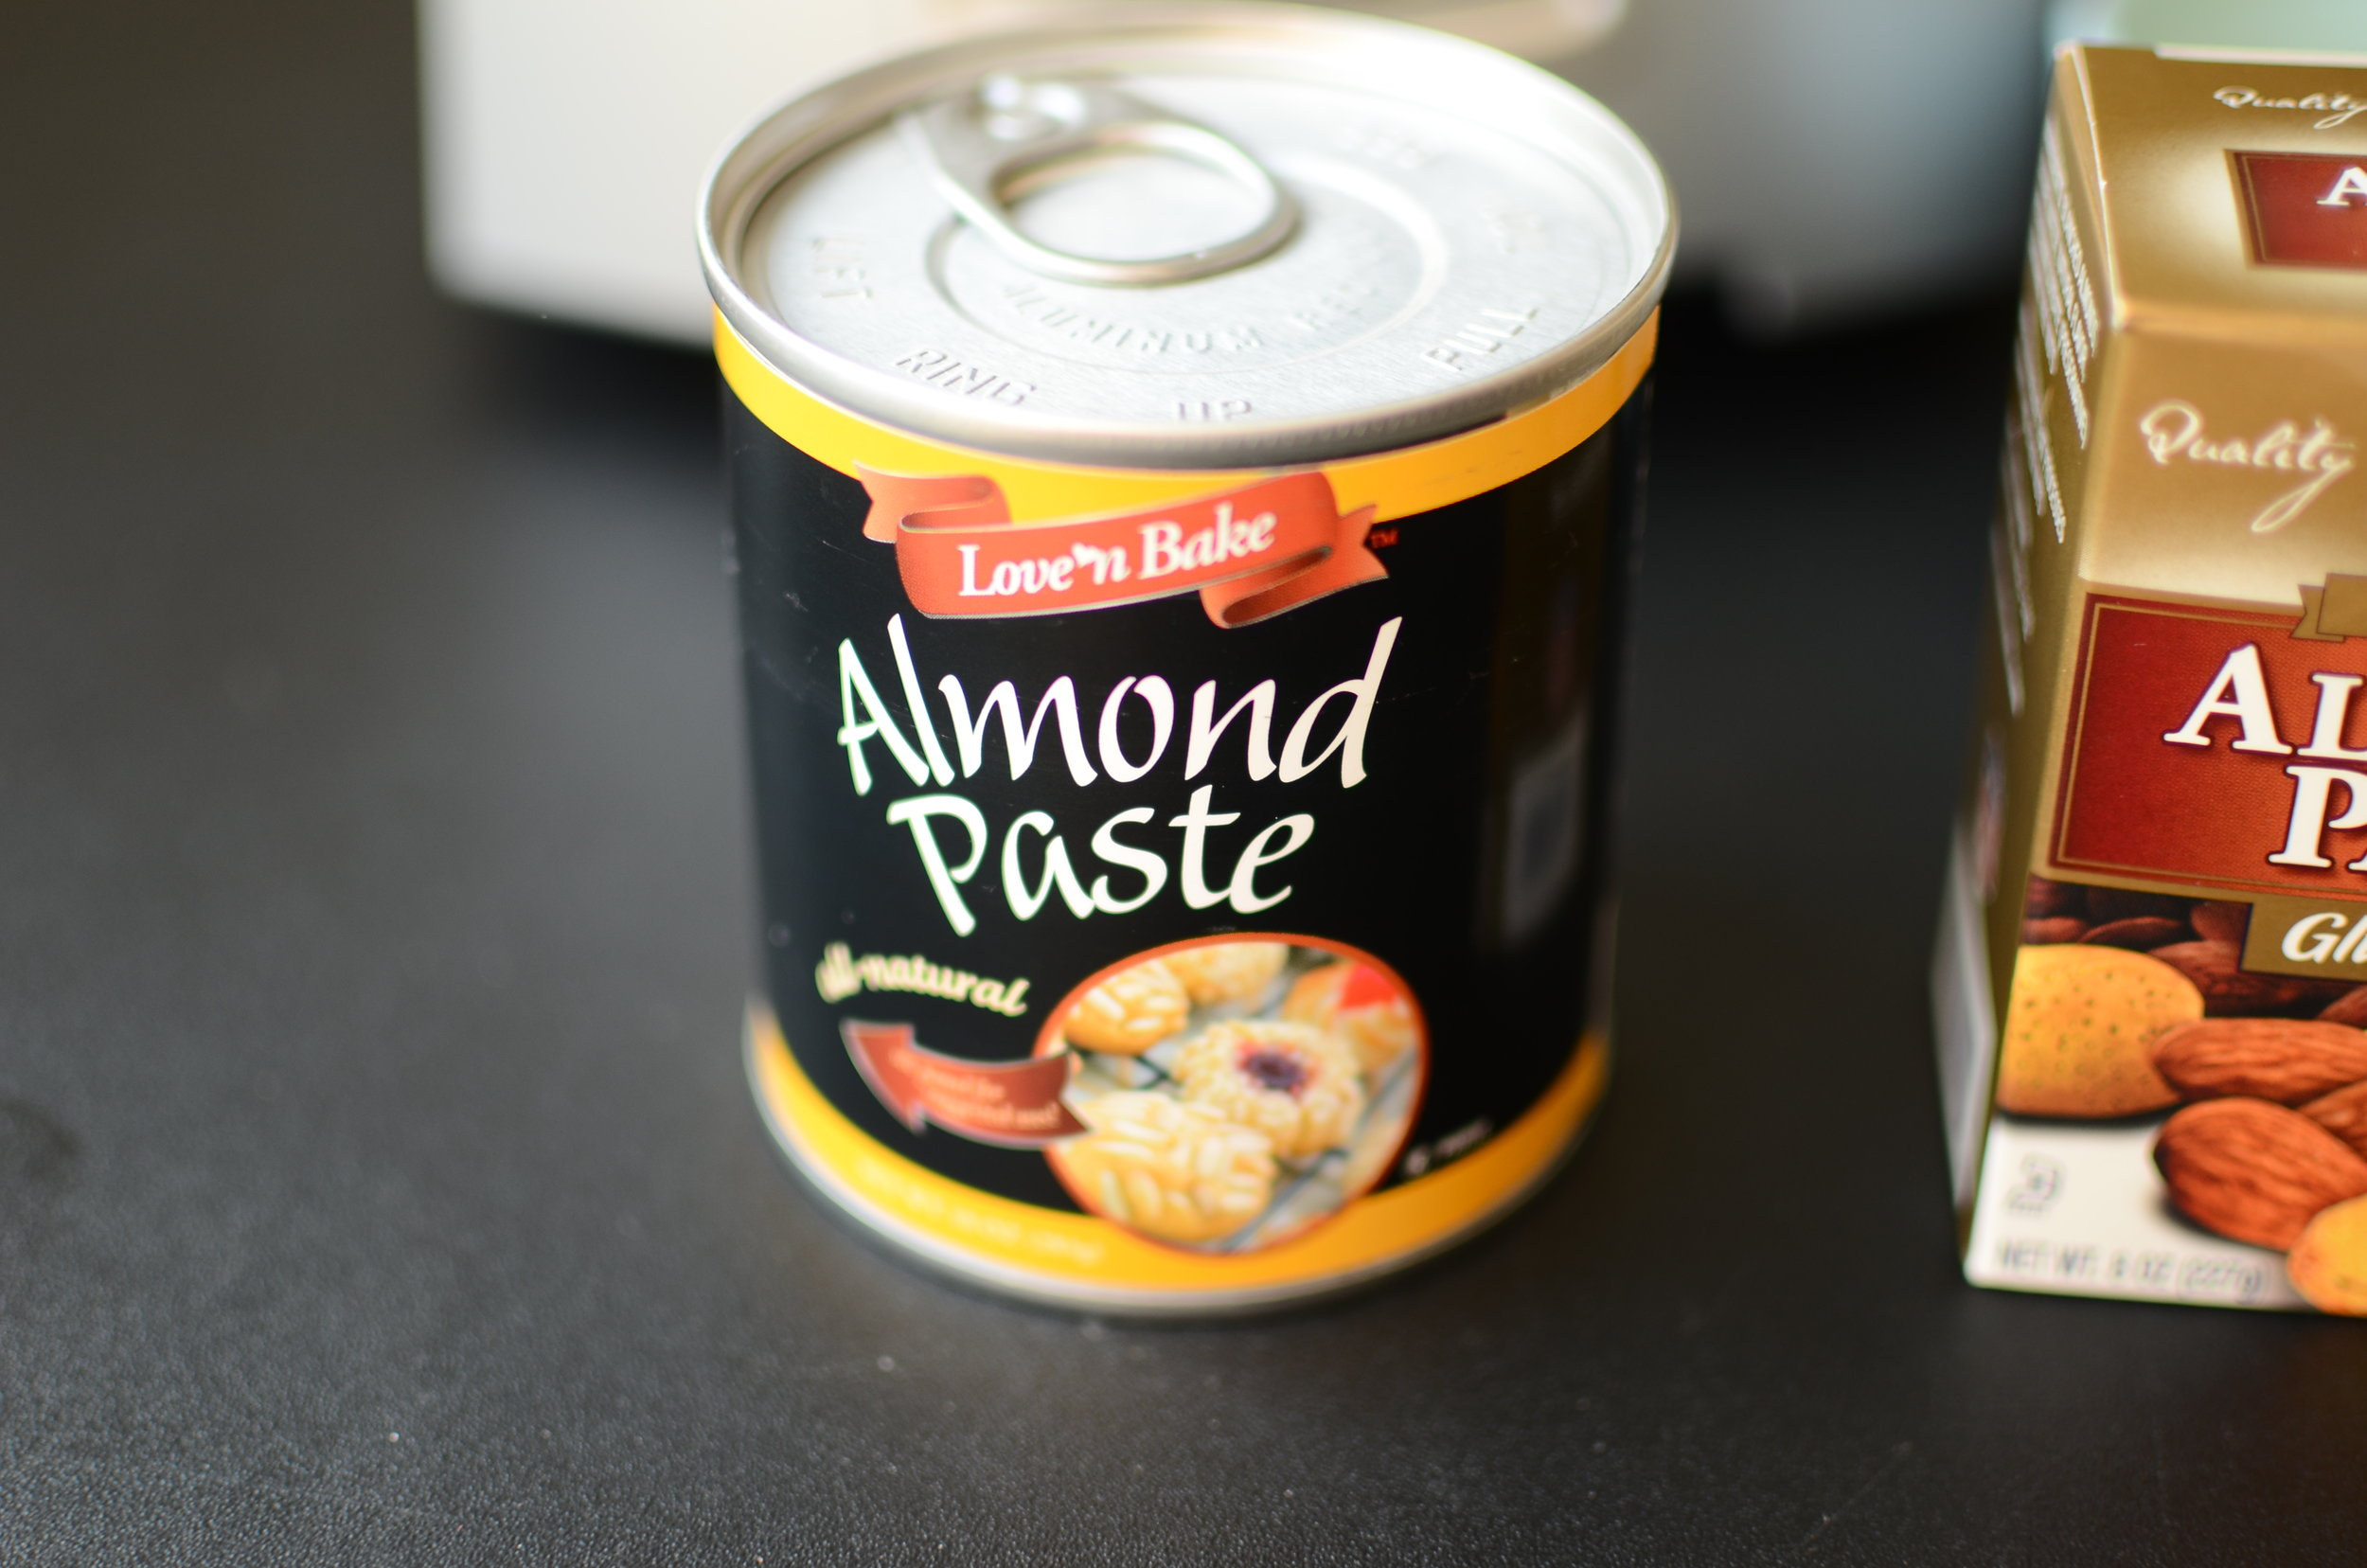 italian cookie recipe that uses almond paste. what to do with almond paste. how to use almond paste.